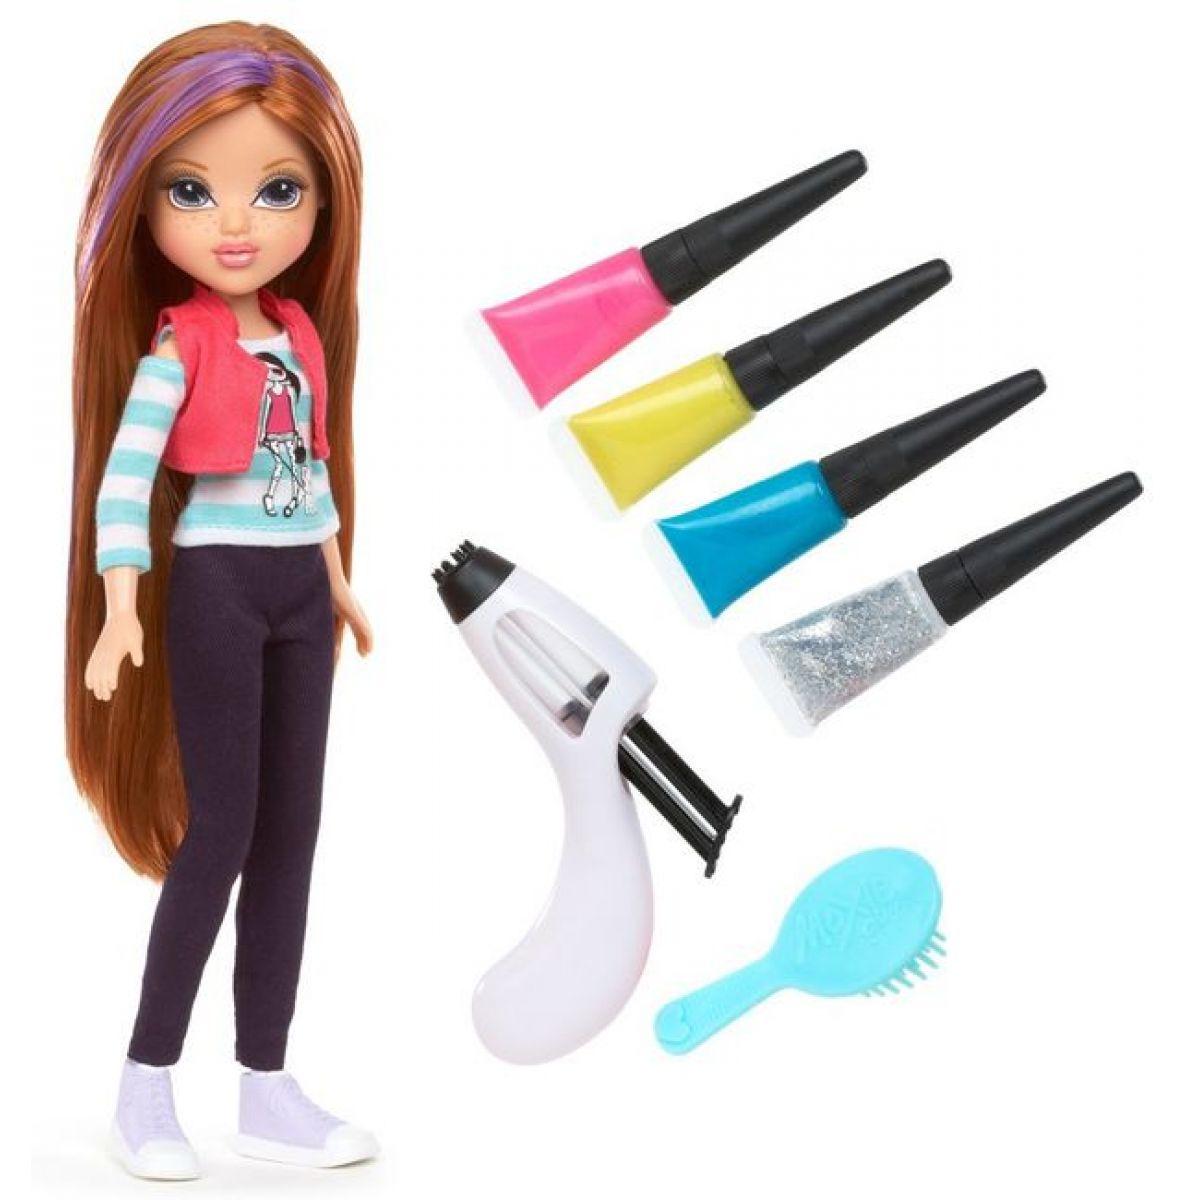 MOXIE GIRLS Magické vlasy s barevným melírem - Brunetka